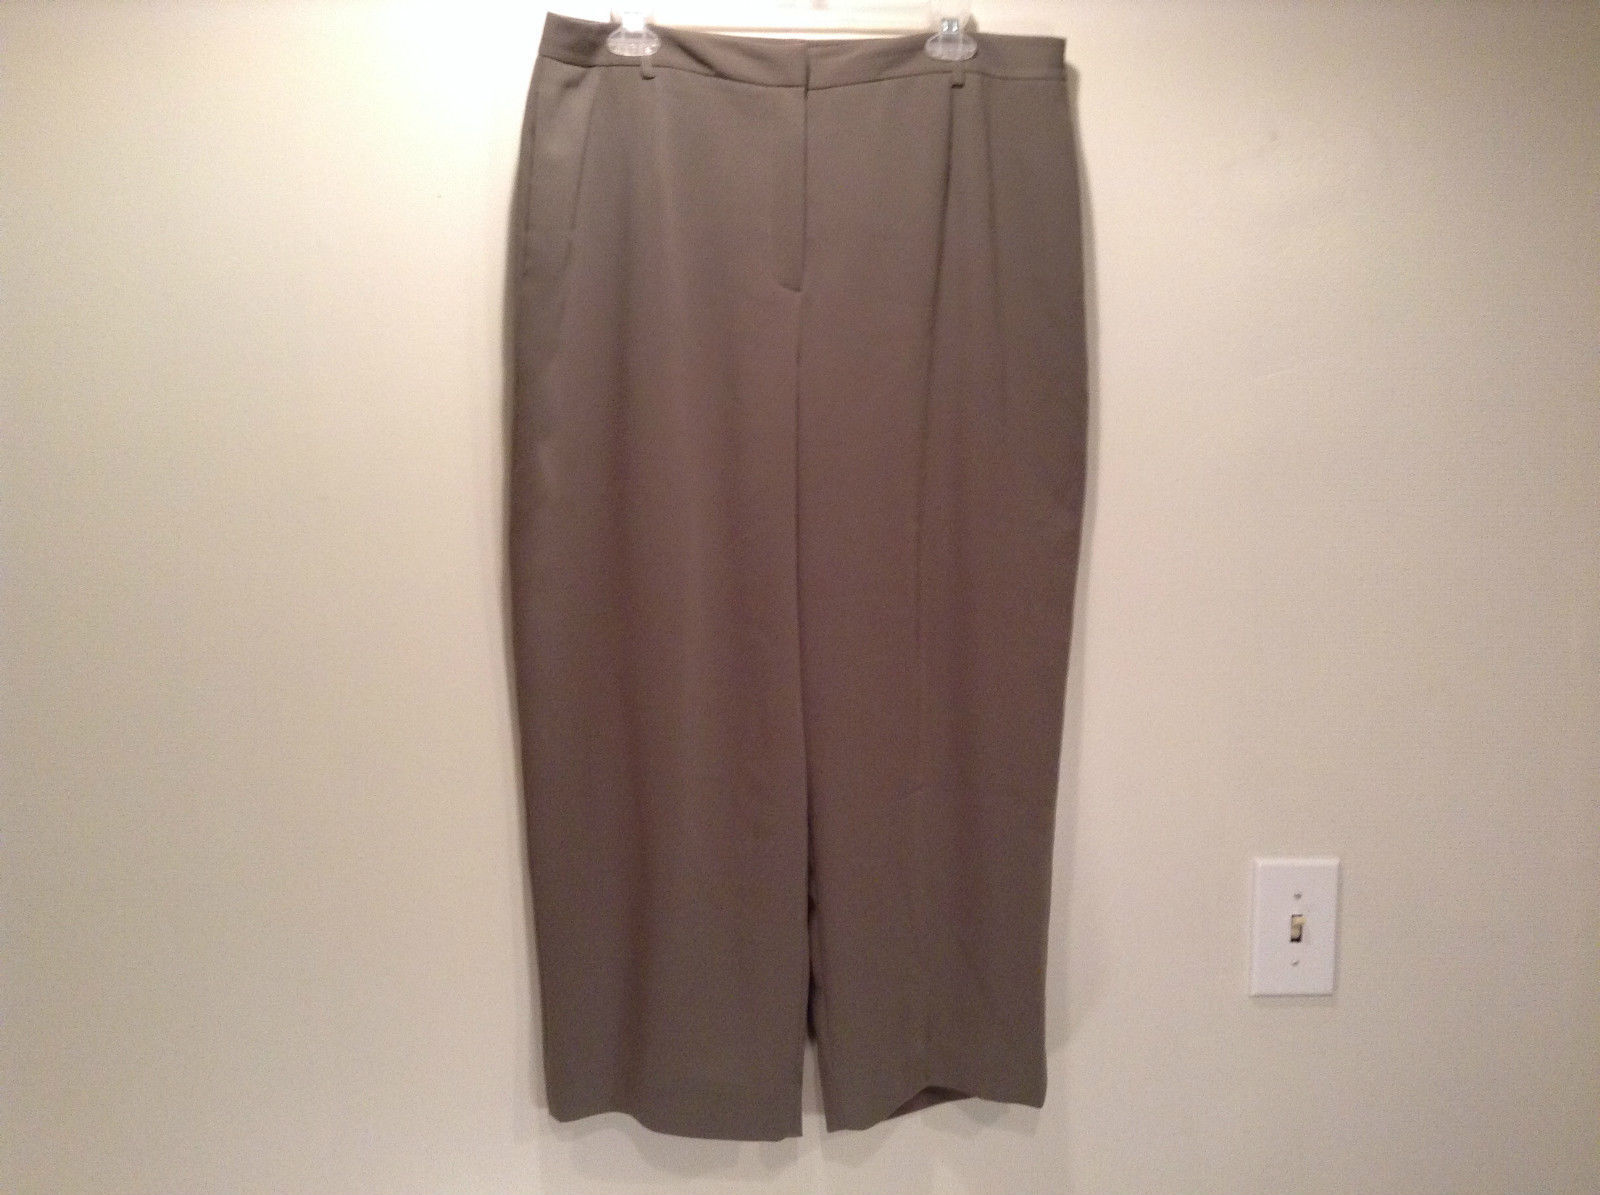 Yansi Fugel Gray Lined Dress Capri Pants Side Pockets Zipper and Slide Closure